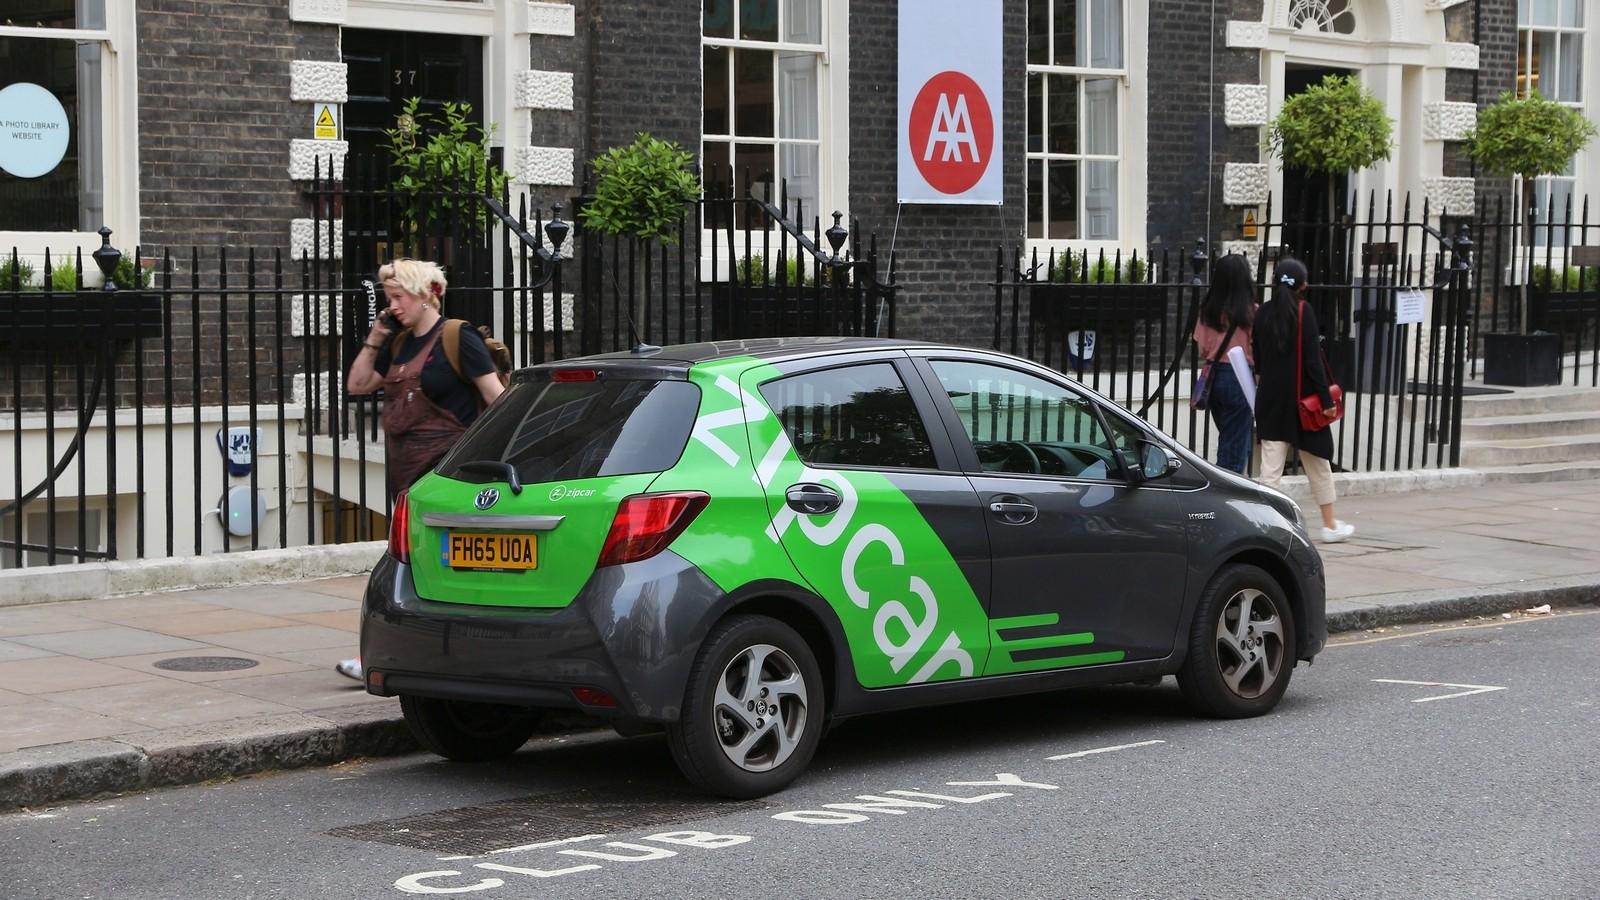 Car sharing — Zipcar